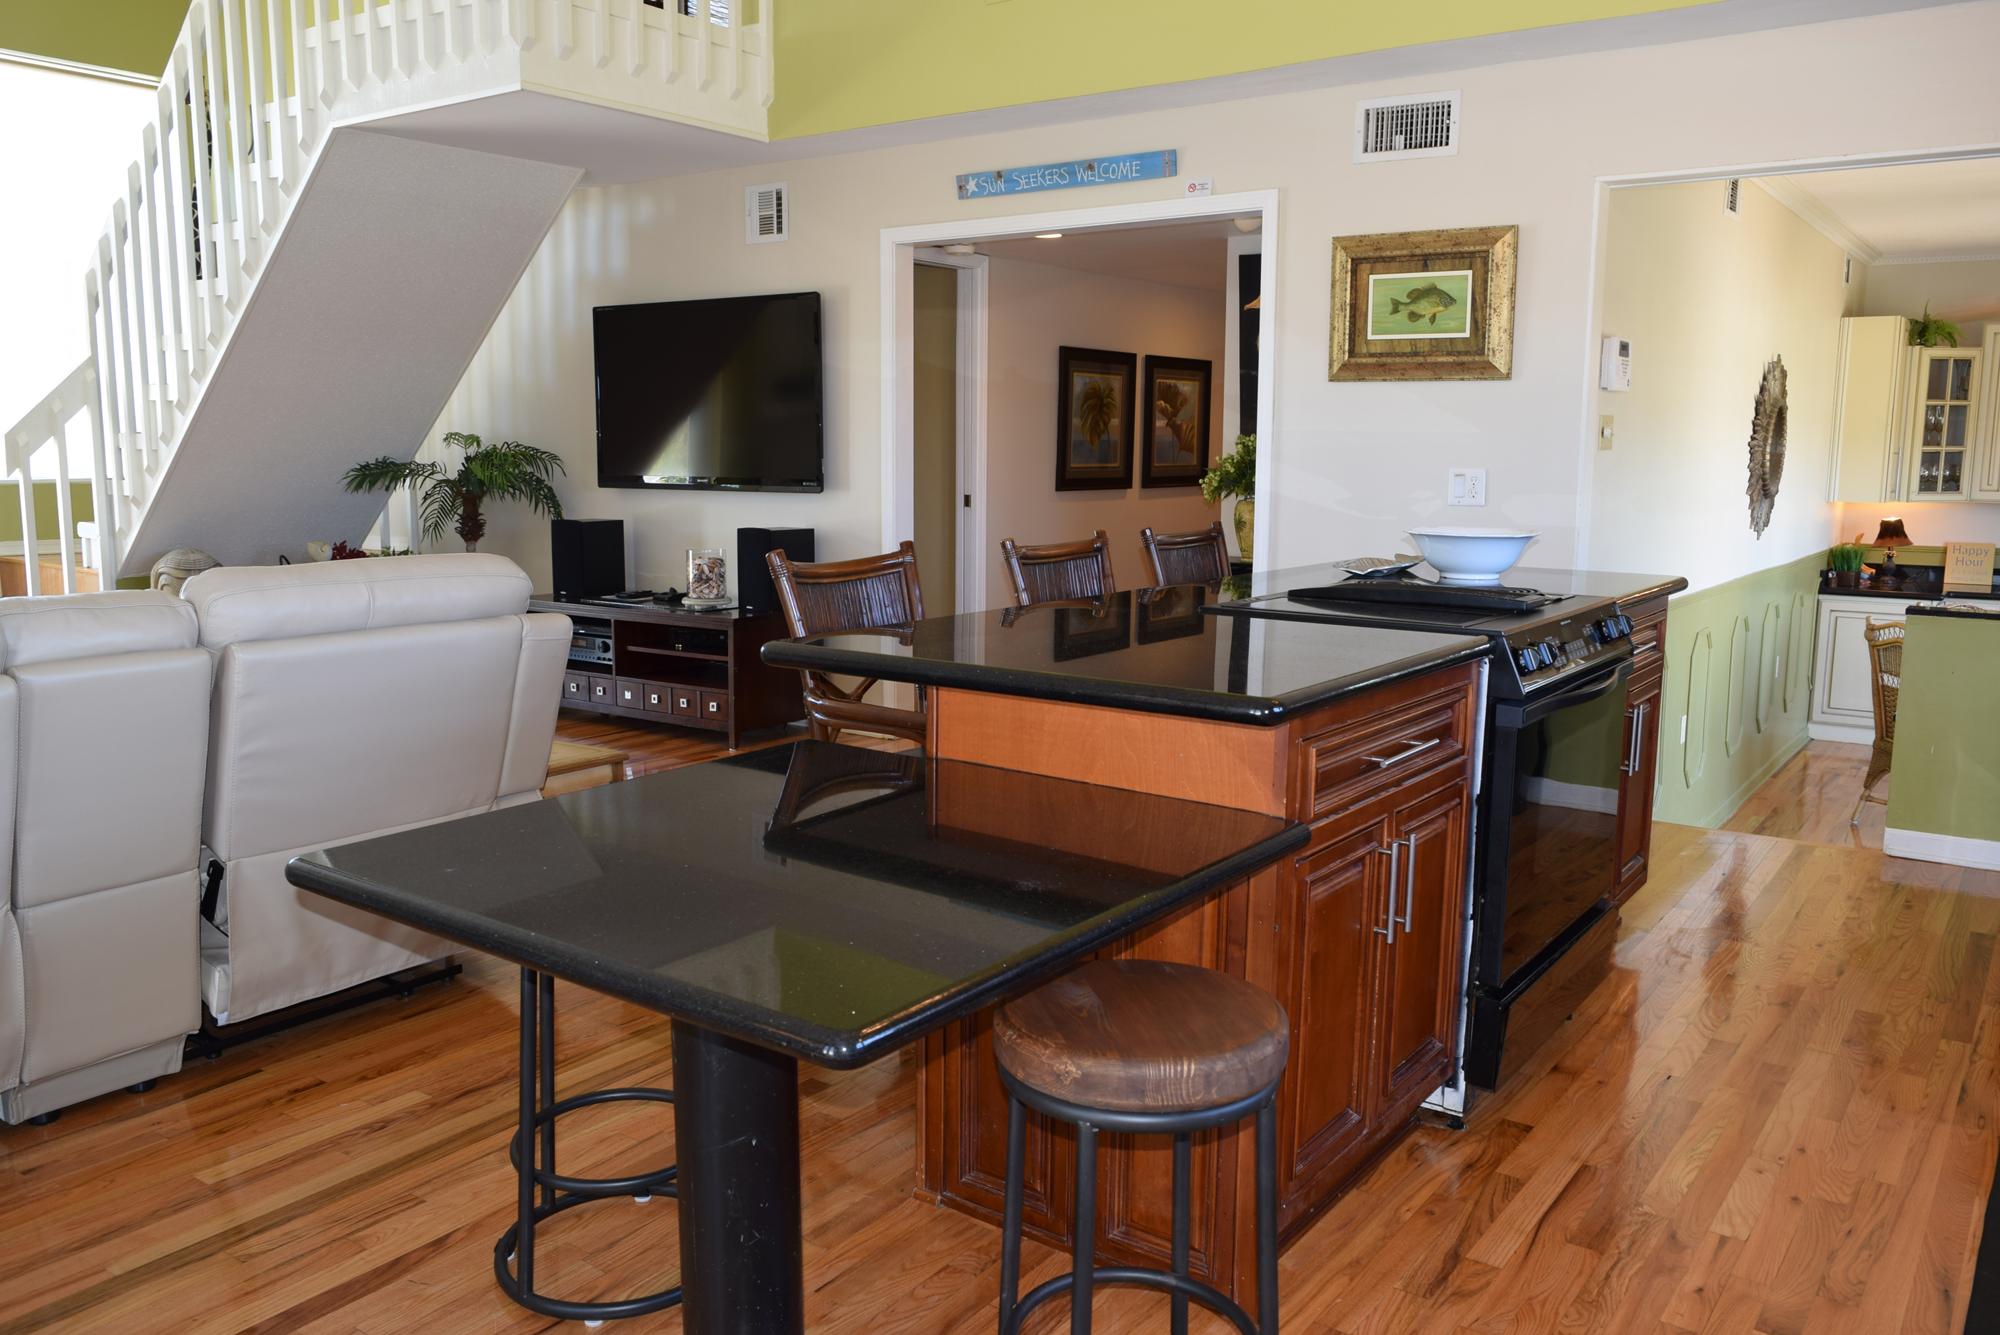 Maldonado 1010 House/Cottage rental in Pensacola Beach House Rentals in Pensacola Beach Florida - #8